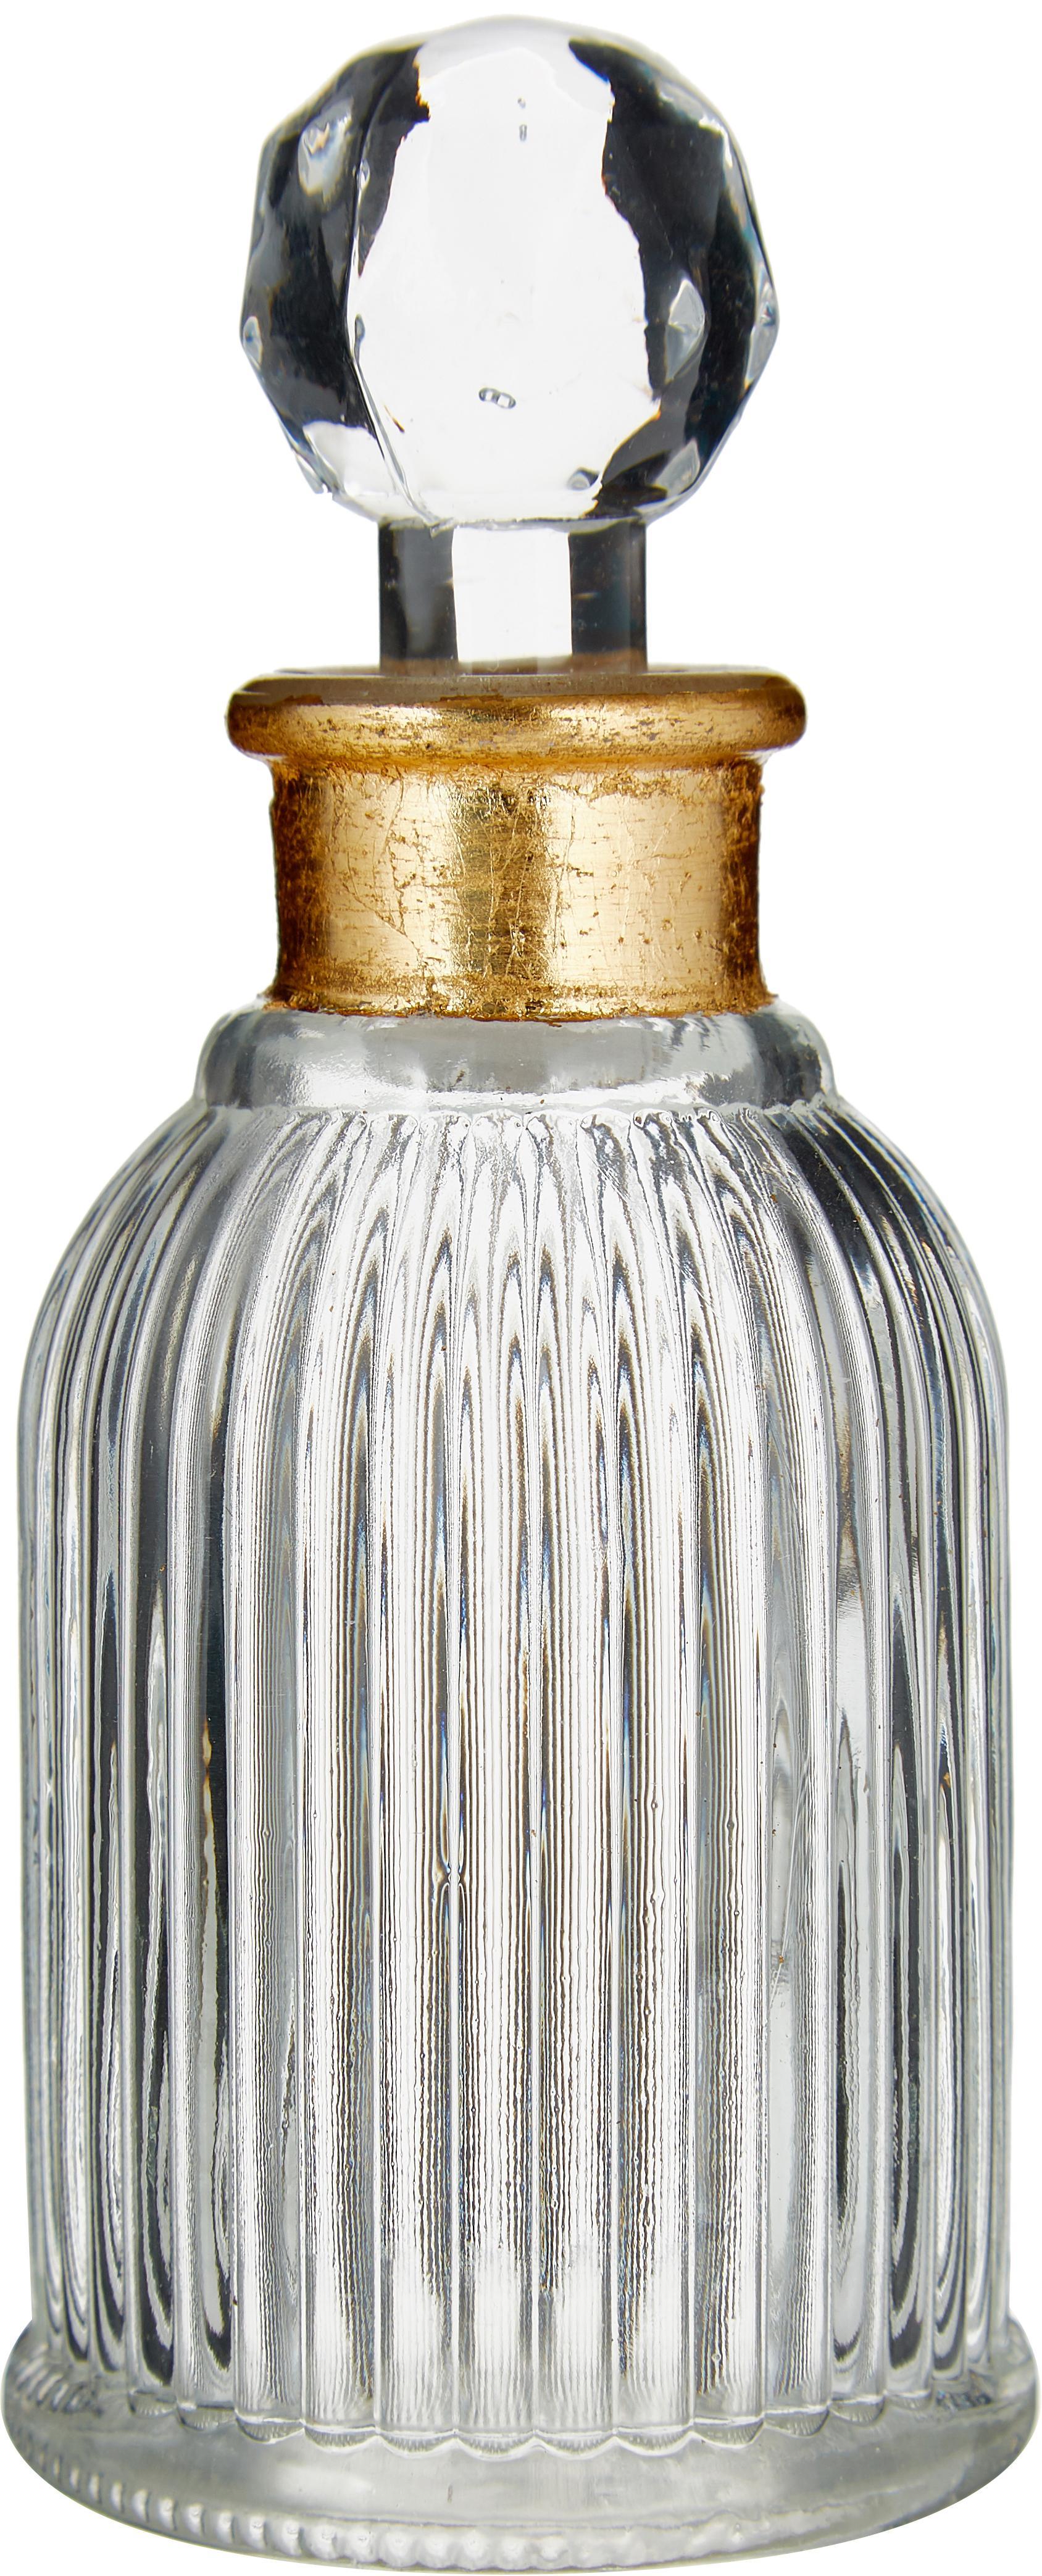 Bottiglia decorativa Rotira, Vetro verniciato, Trasparente, dorato, Ø 6 x Alt. 14 cm